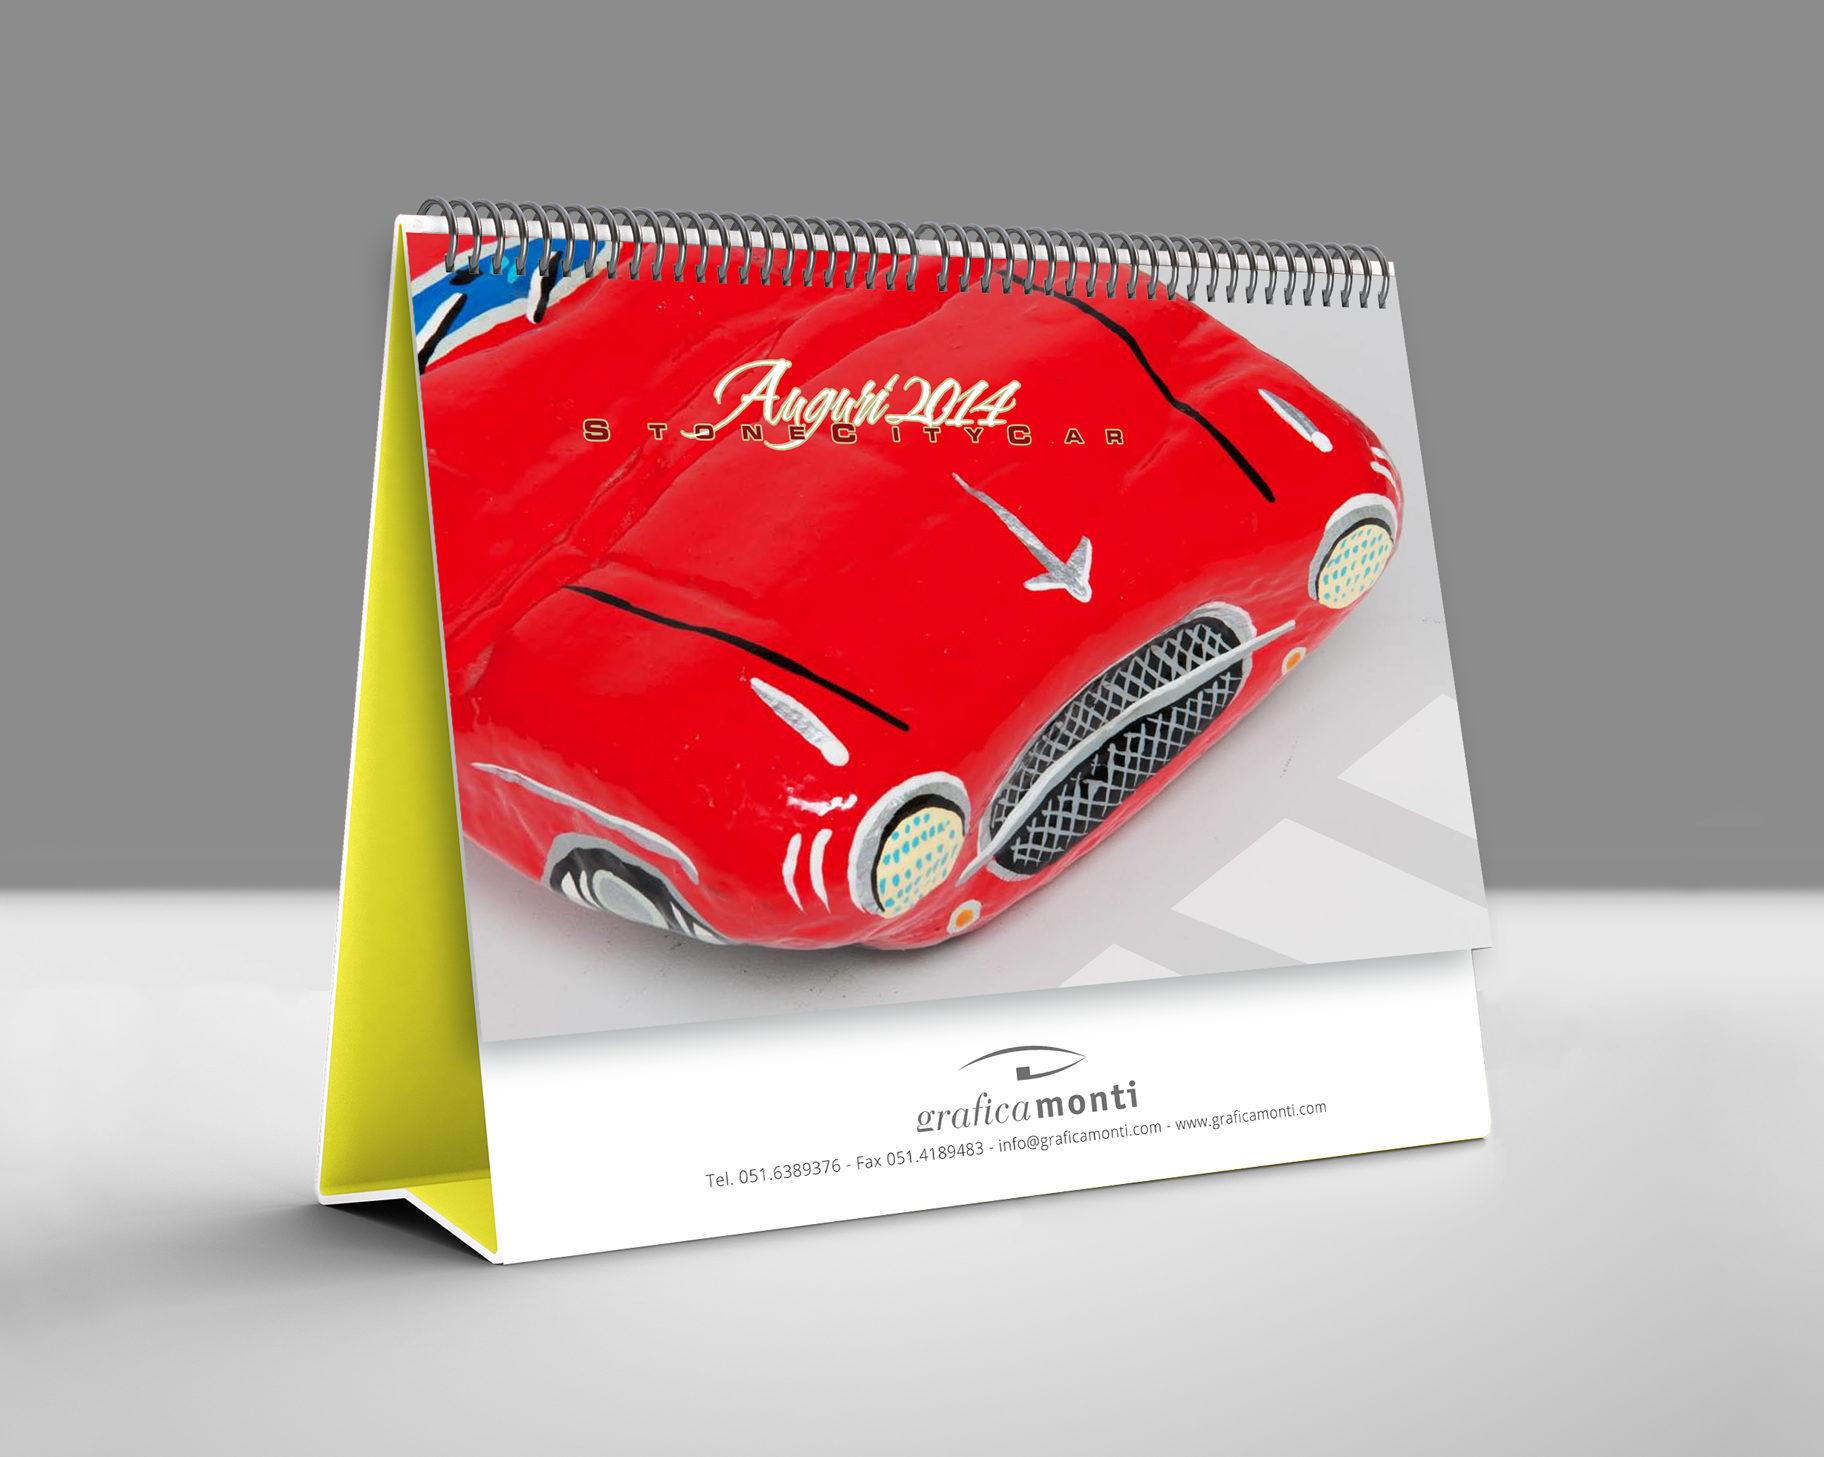 GraficaMonti-Calendario-2014